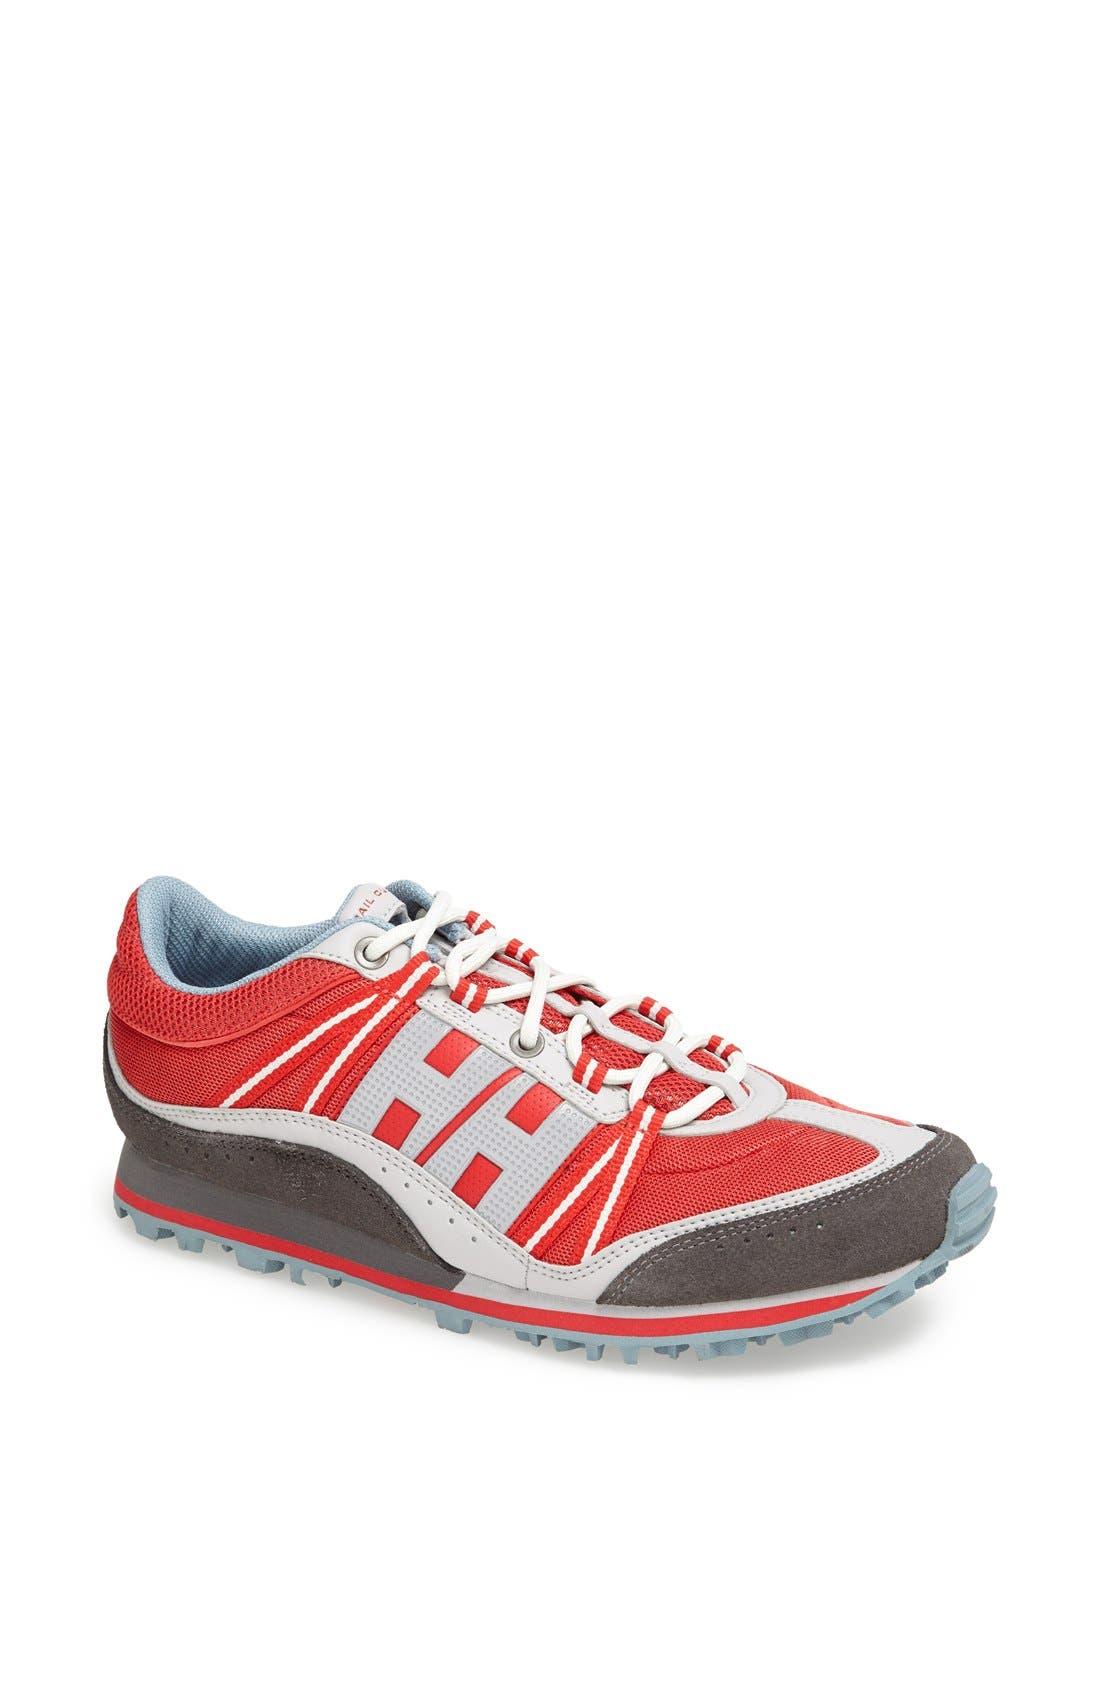 Alternate Image 1 Selected - Helly Hansen 'Trail Cutter 5' Running Shoe (Women)